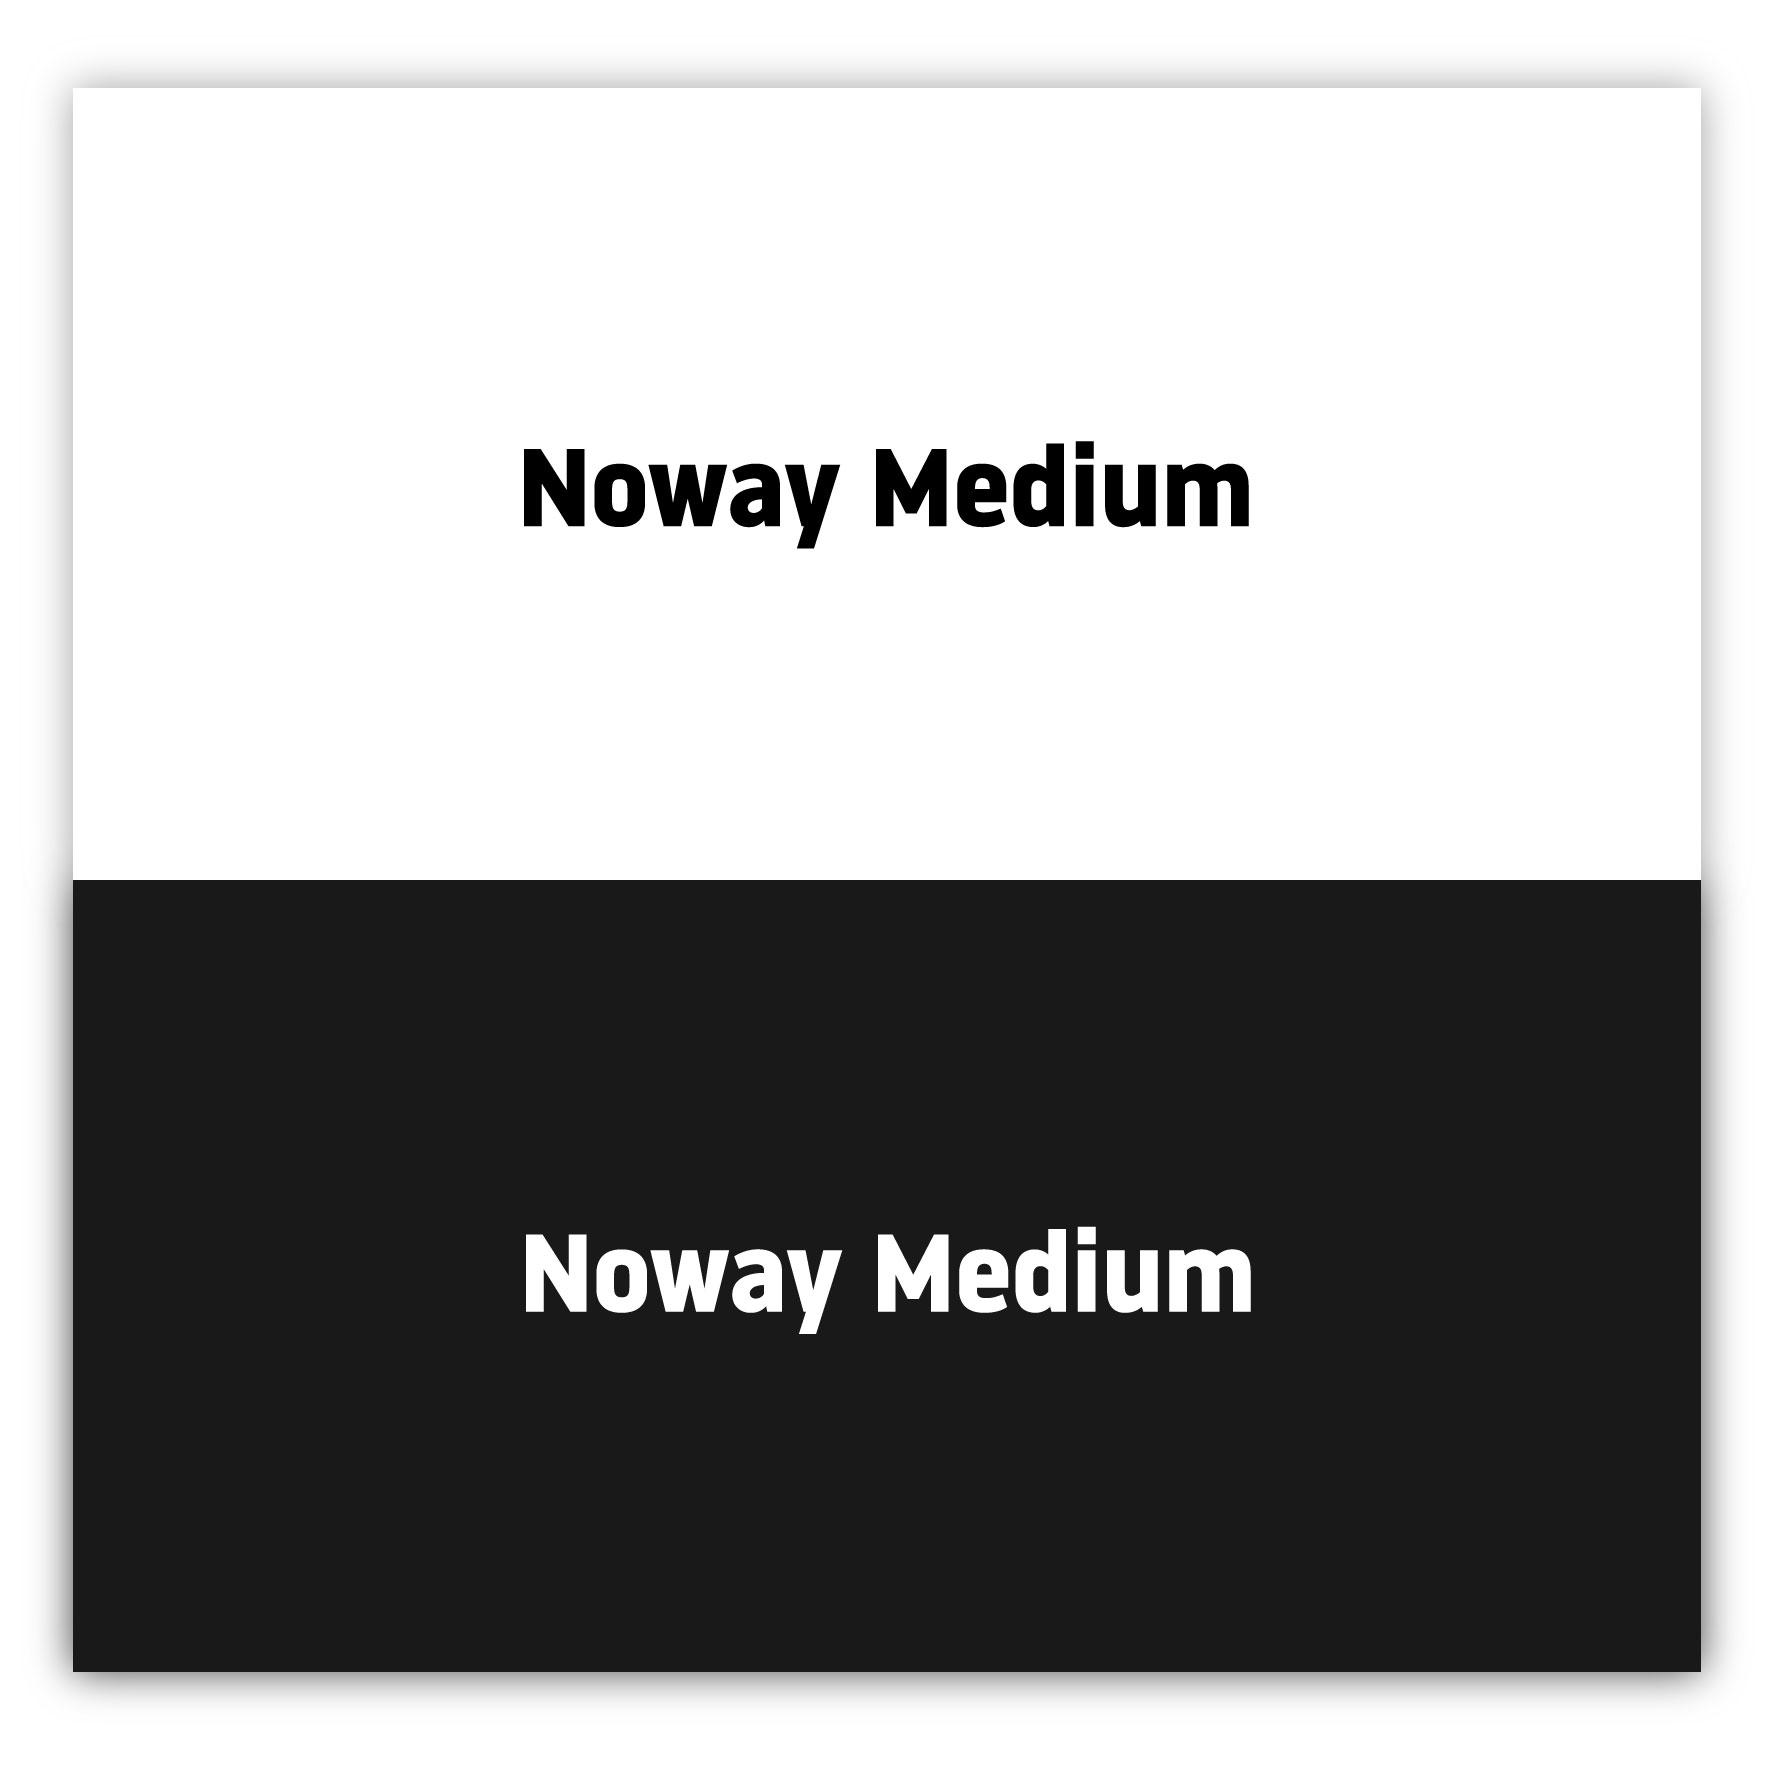 Medium Noway - Best fonts of 2021